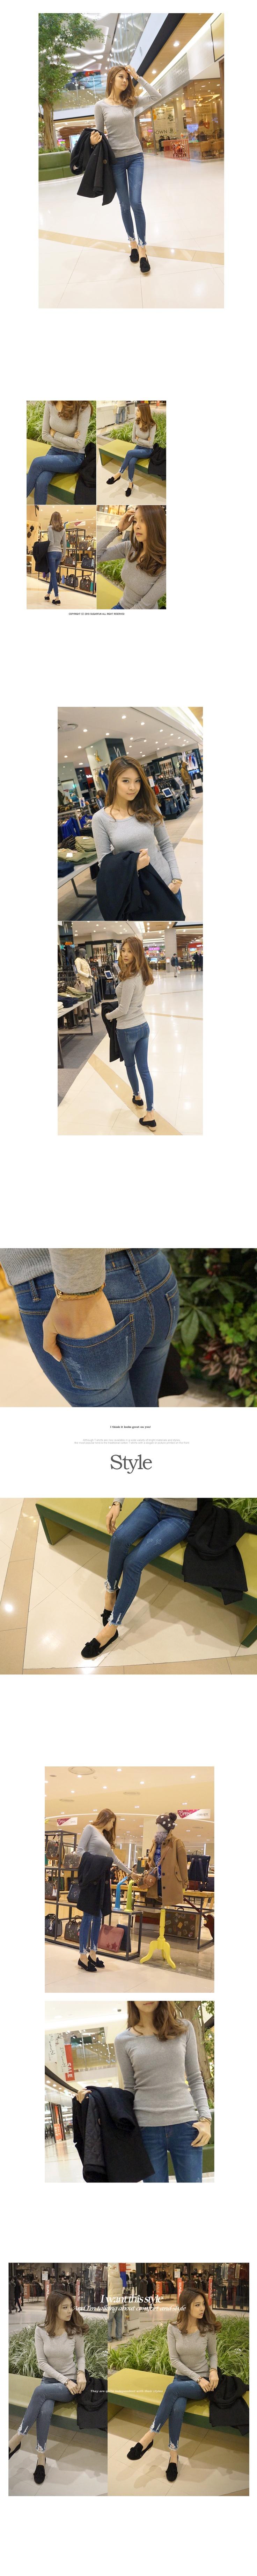 Jual jeans Korea Buy Sell Authentic Korean Skirt Fashion Online Sugarfun Skinny Jeans LFBTM_078_1263 $118 #malaysianbabes #malaysianshopper #malaysiashopper #malaysiashopping #malaysianshopping #onlineshop #onlineshopping #sggirls #koreafashion #koreanfashion #fashion #pikomiko #shoppingspree #spree #poslaju #posmalaysia #malaysiashop